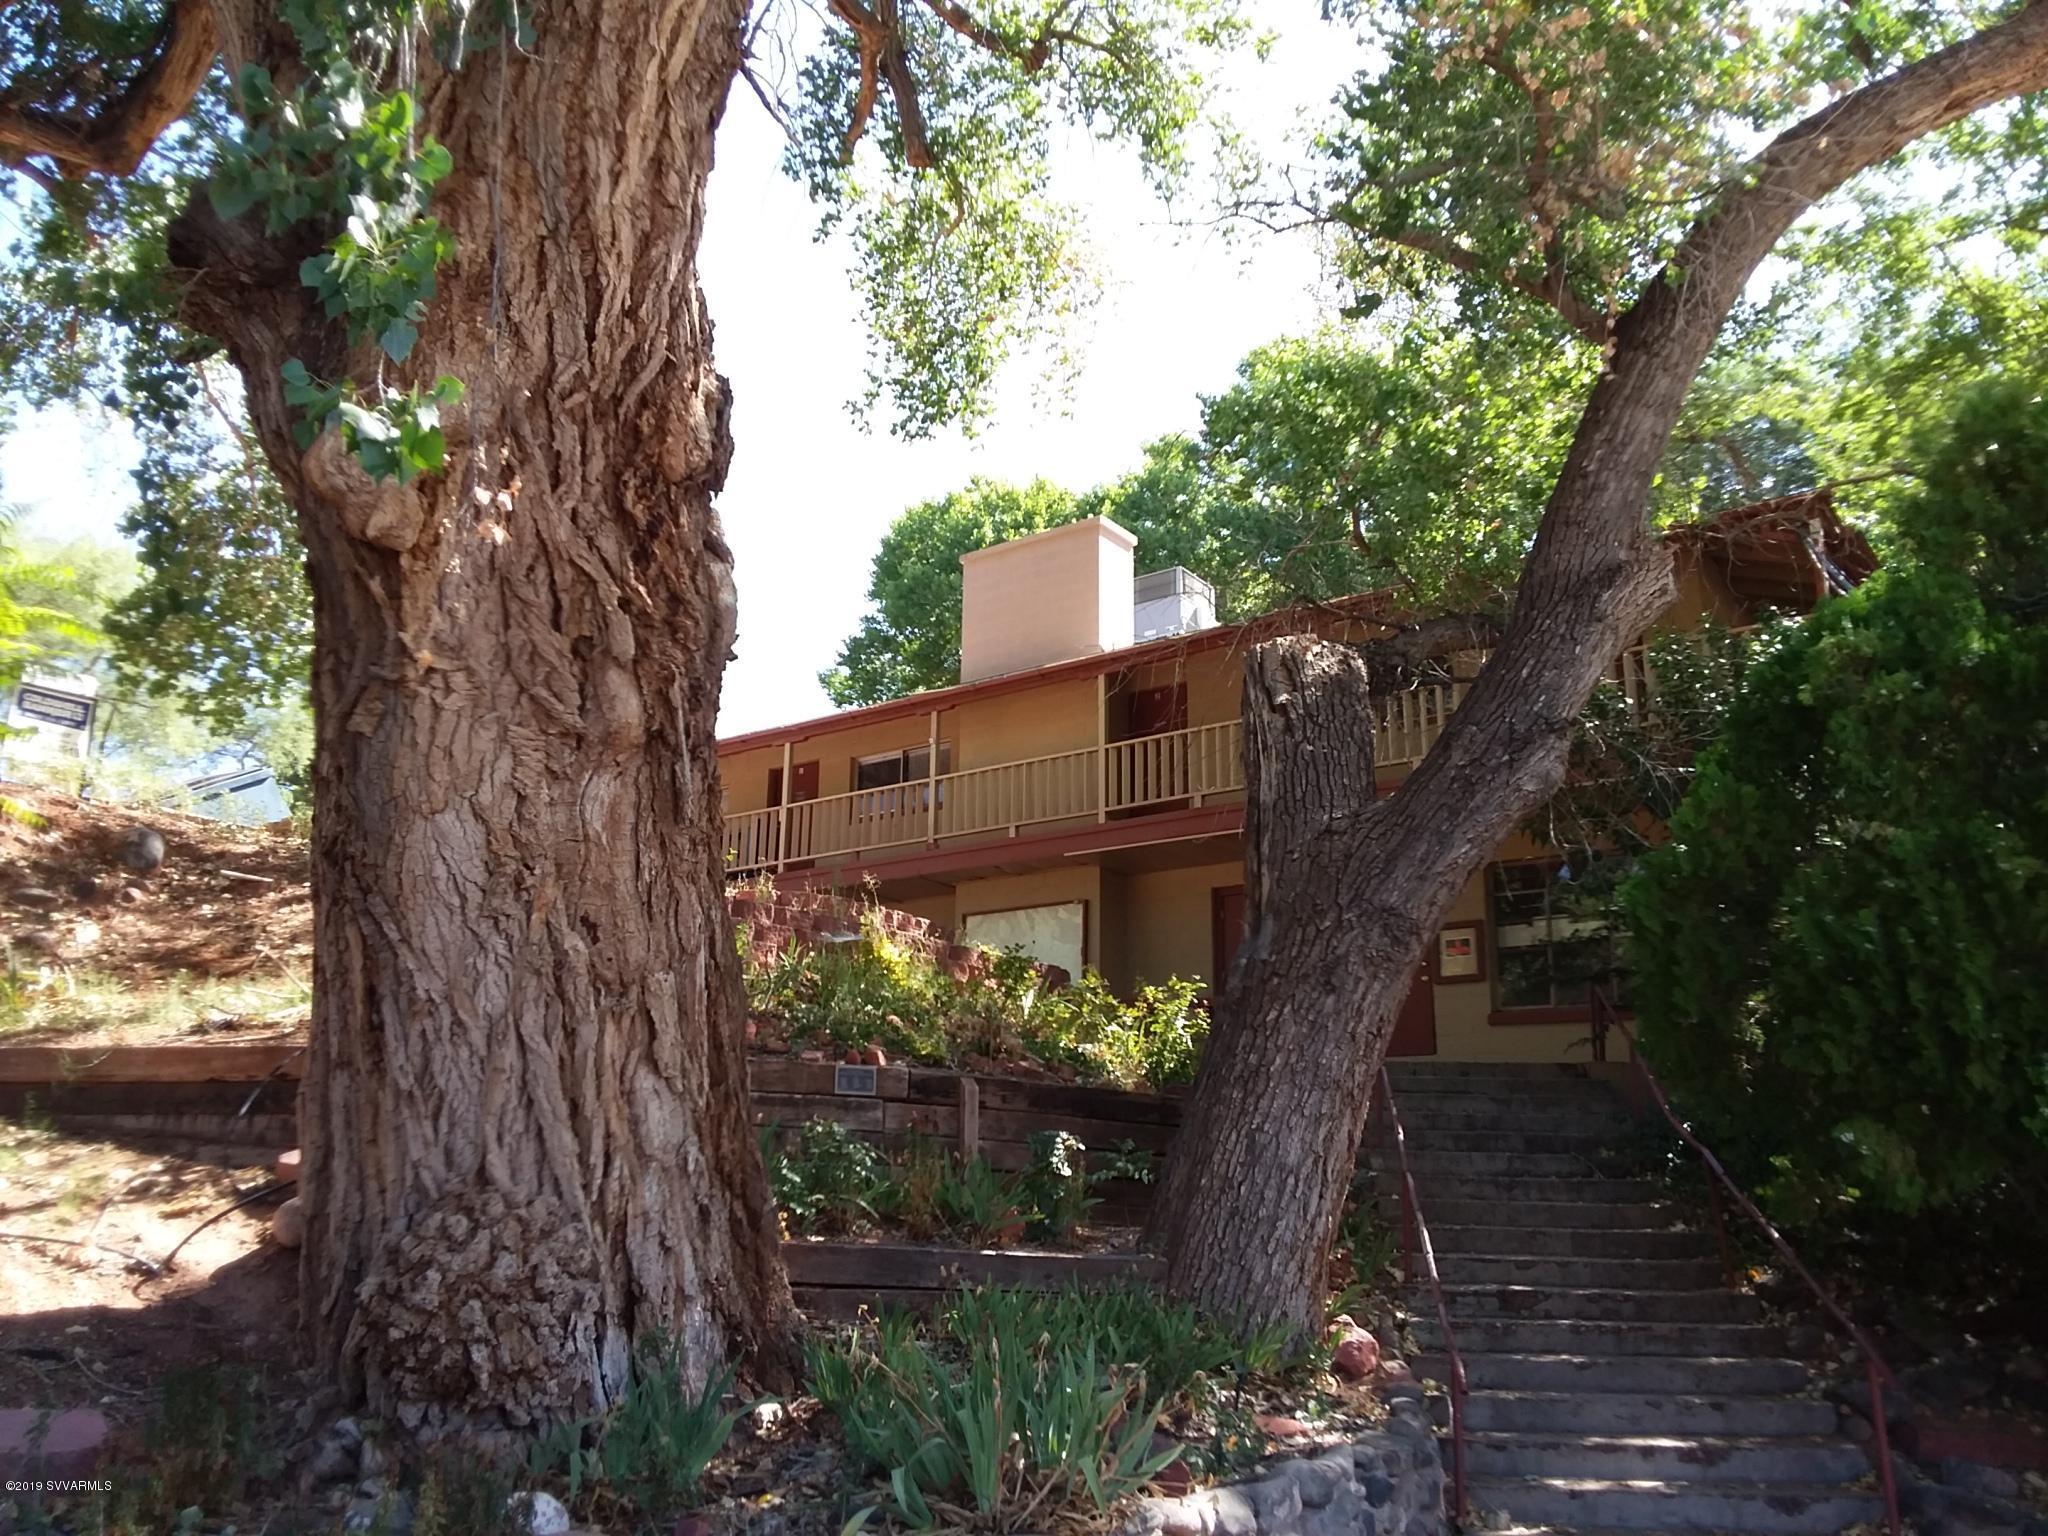 1155 /1165 N Willow Point Rd Cornville, AZ 86325